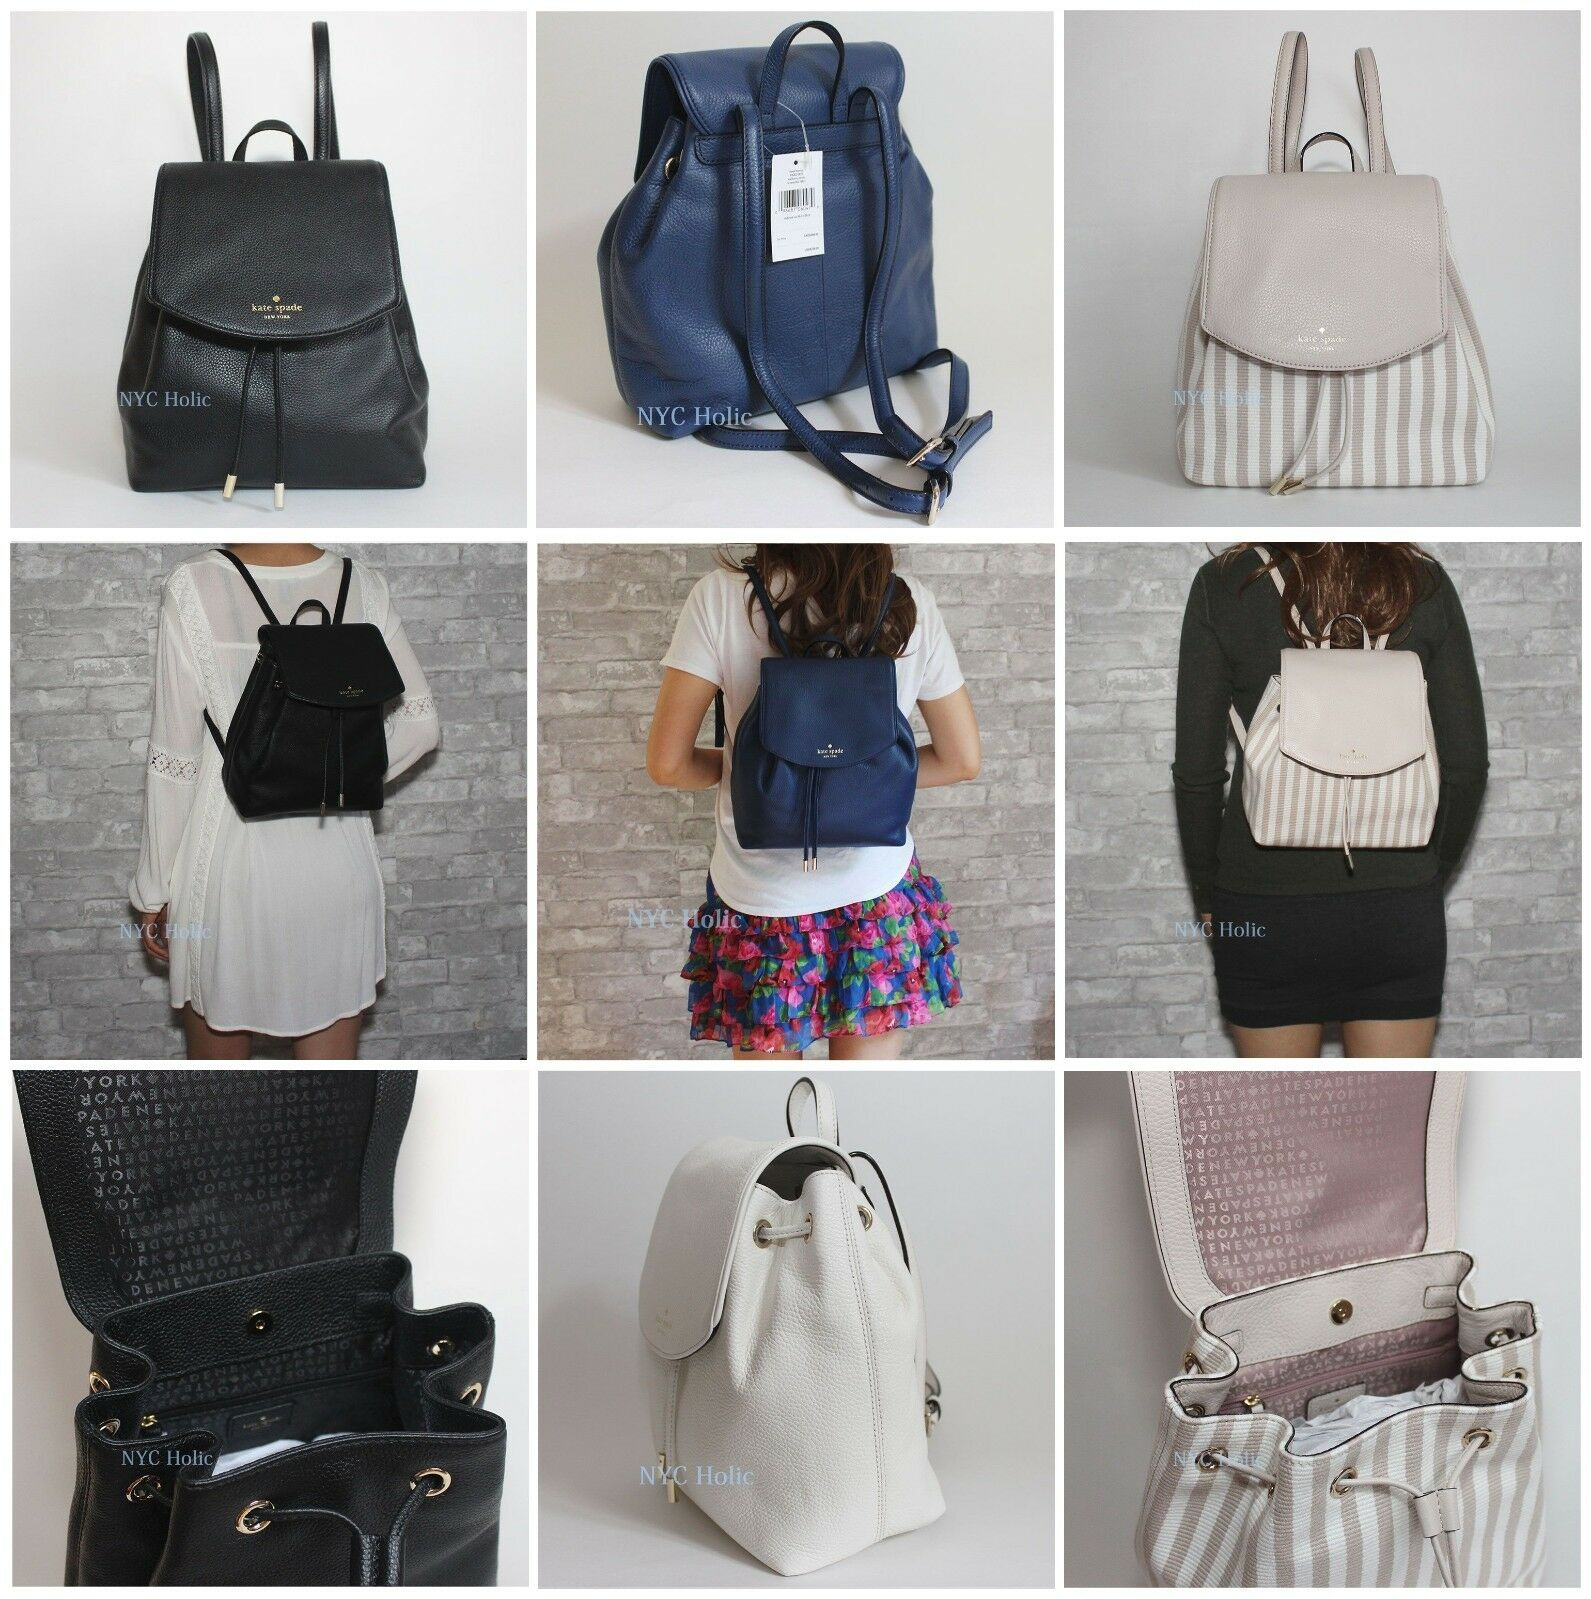 d590e620c8732 New Kate Spade Small Breezy Mulberry Street Backpack Bag WKRU3939 ...